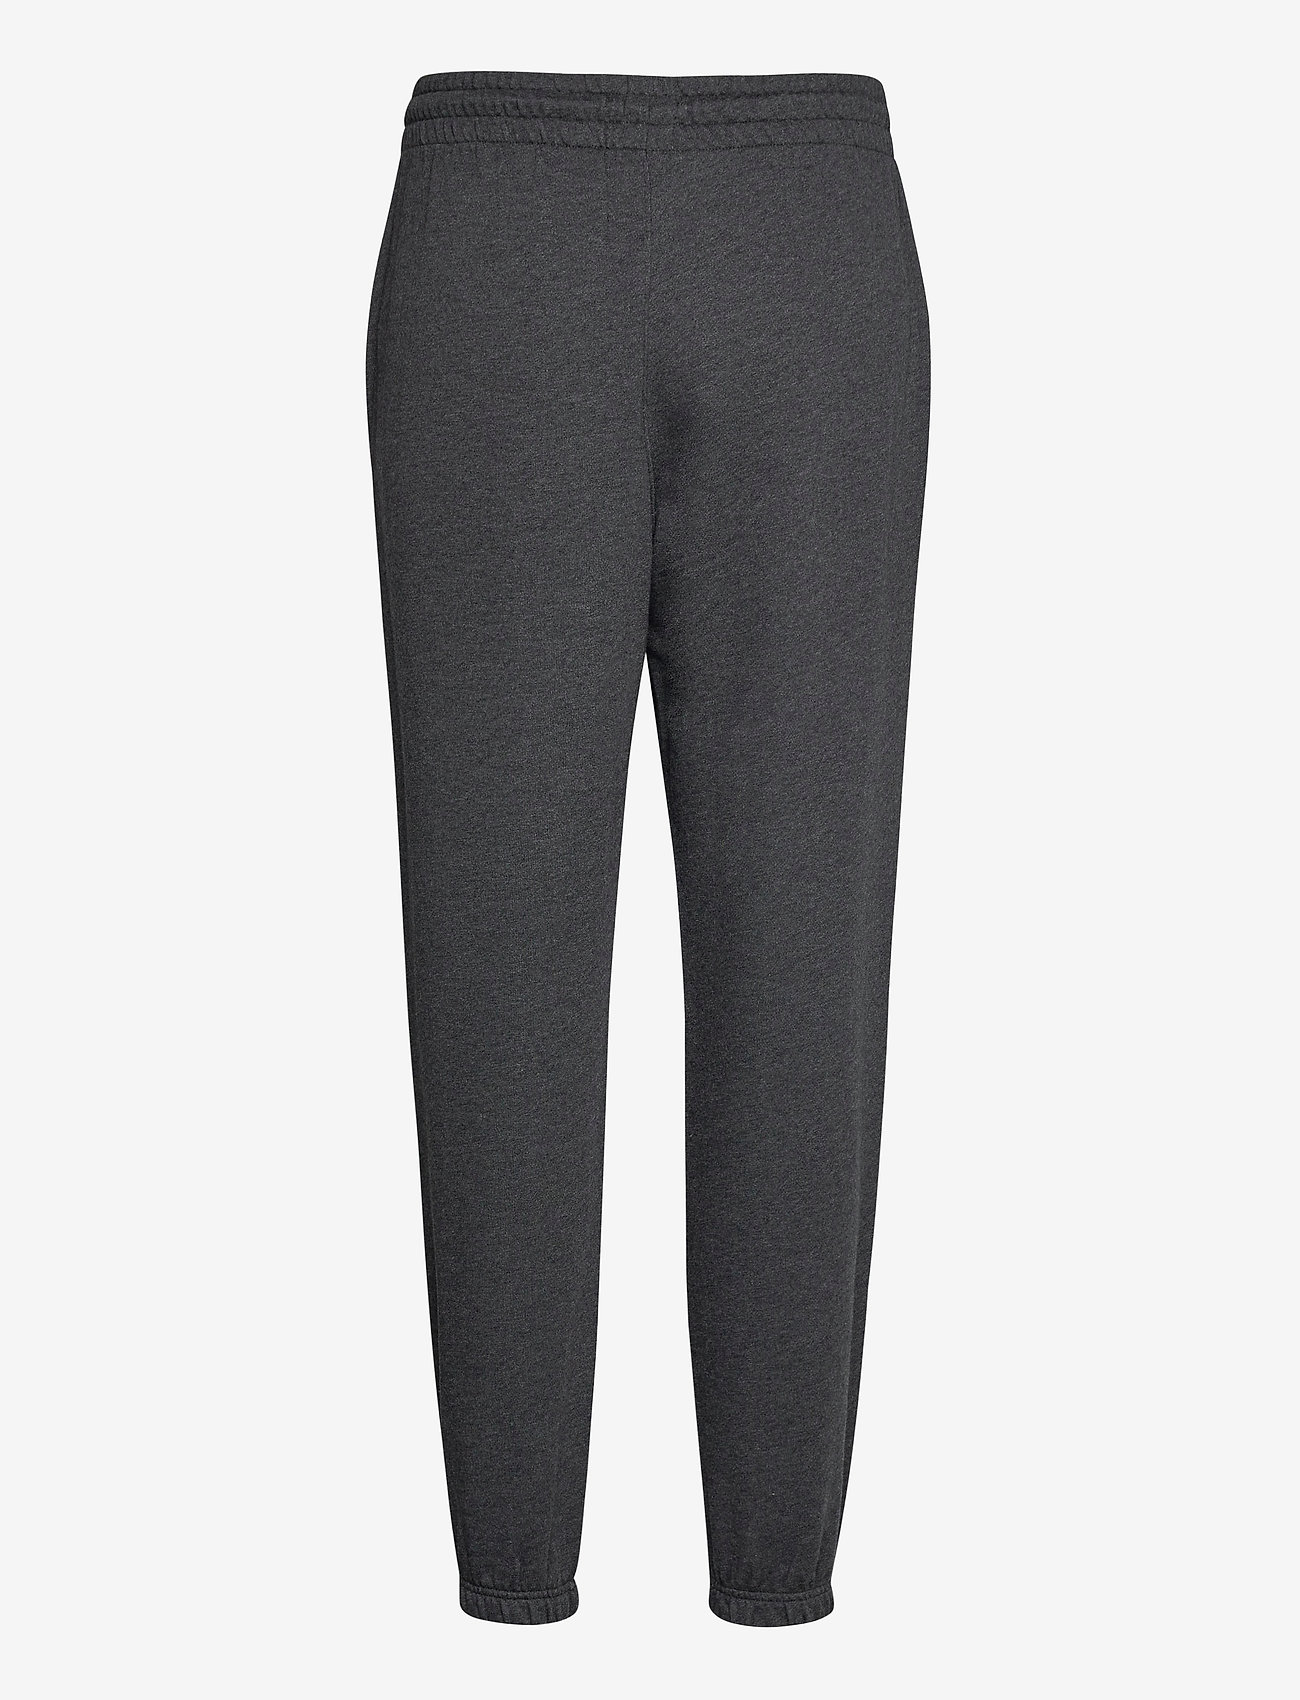 GAP - GAP SHINE JOGGER - sweatpants - charcoal heather - 1